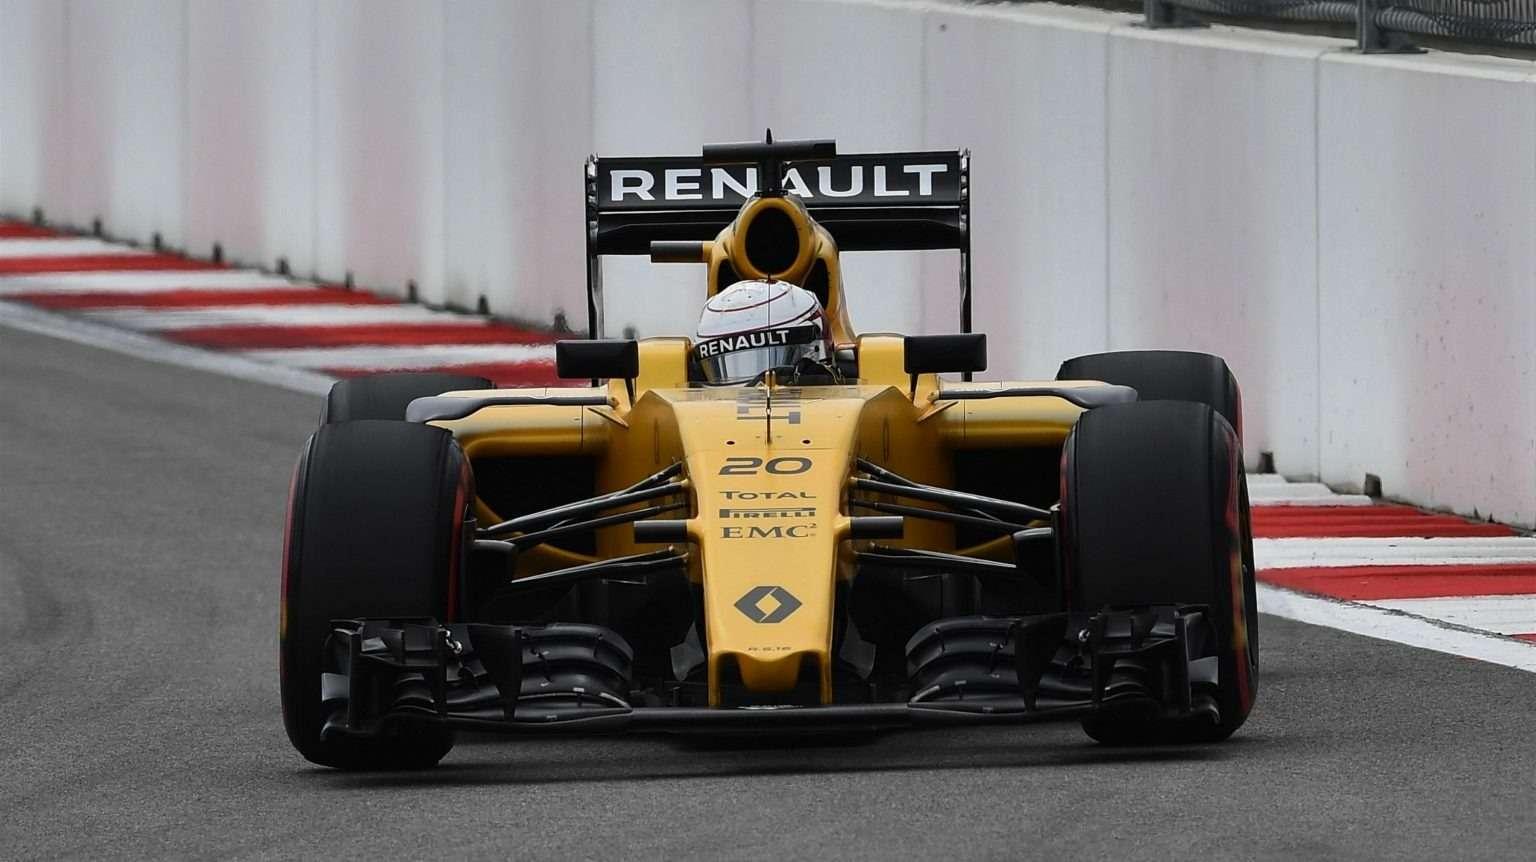 Формула 1, Сочи, Гран При России, Сочи Автодром, Кевин Магнуссен, Renault